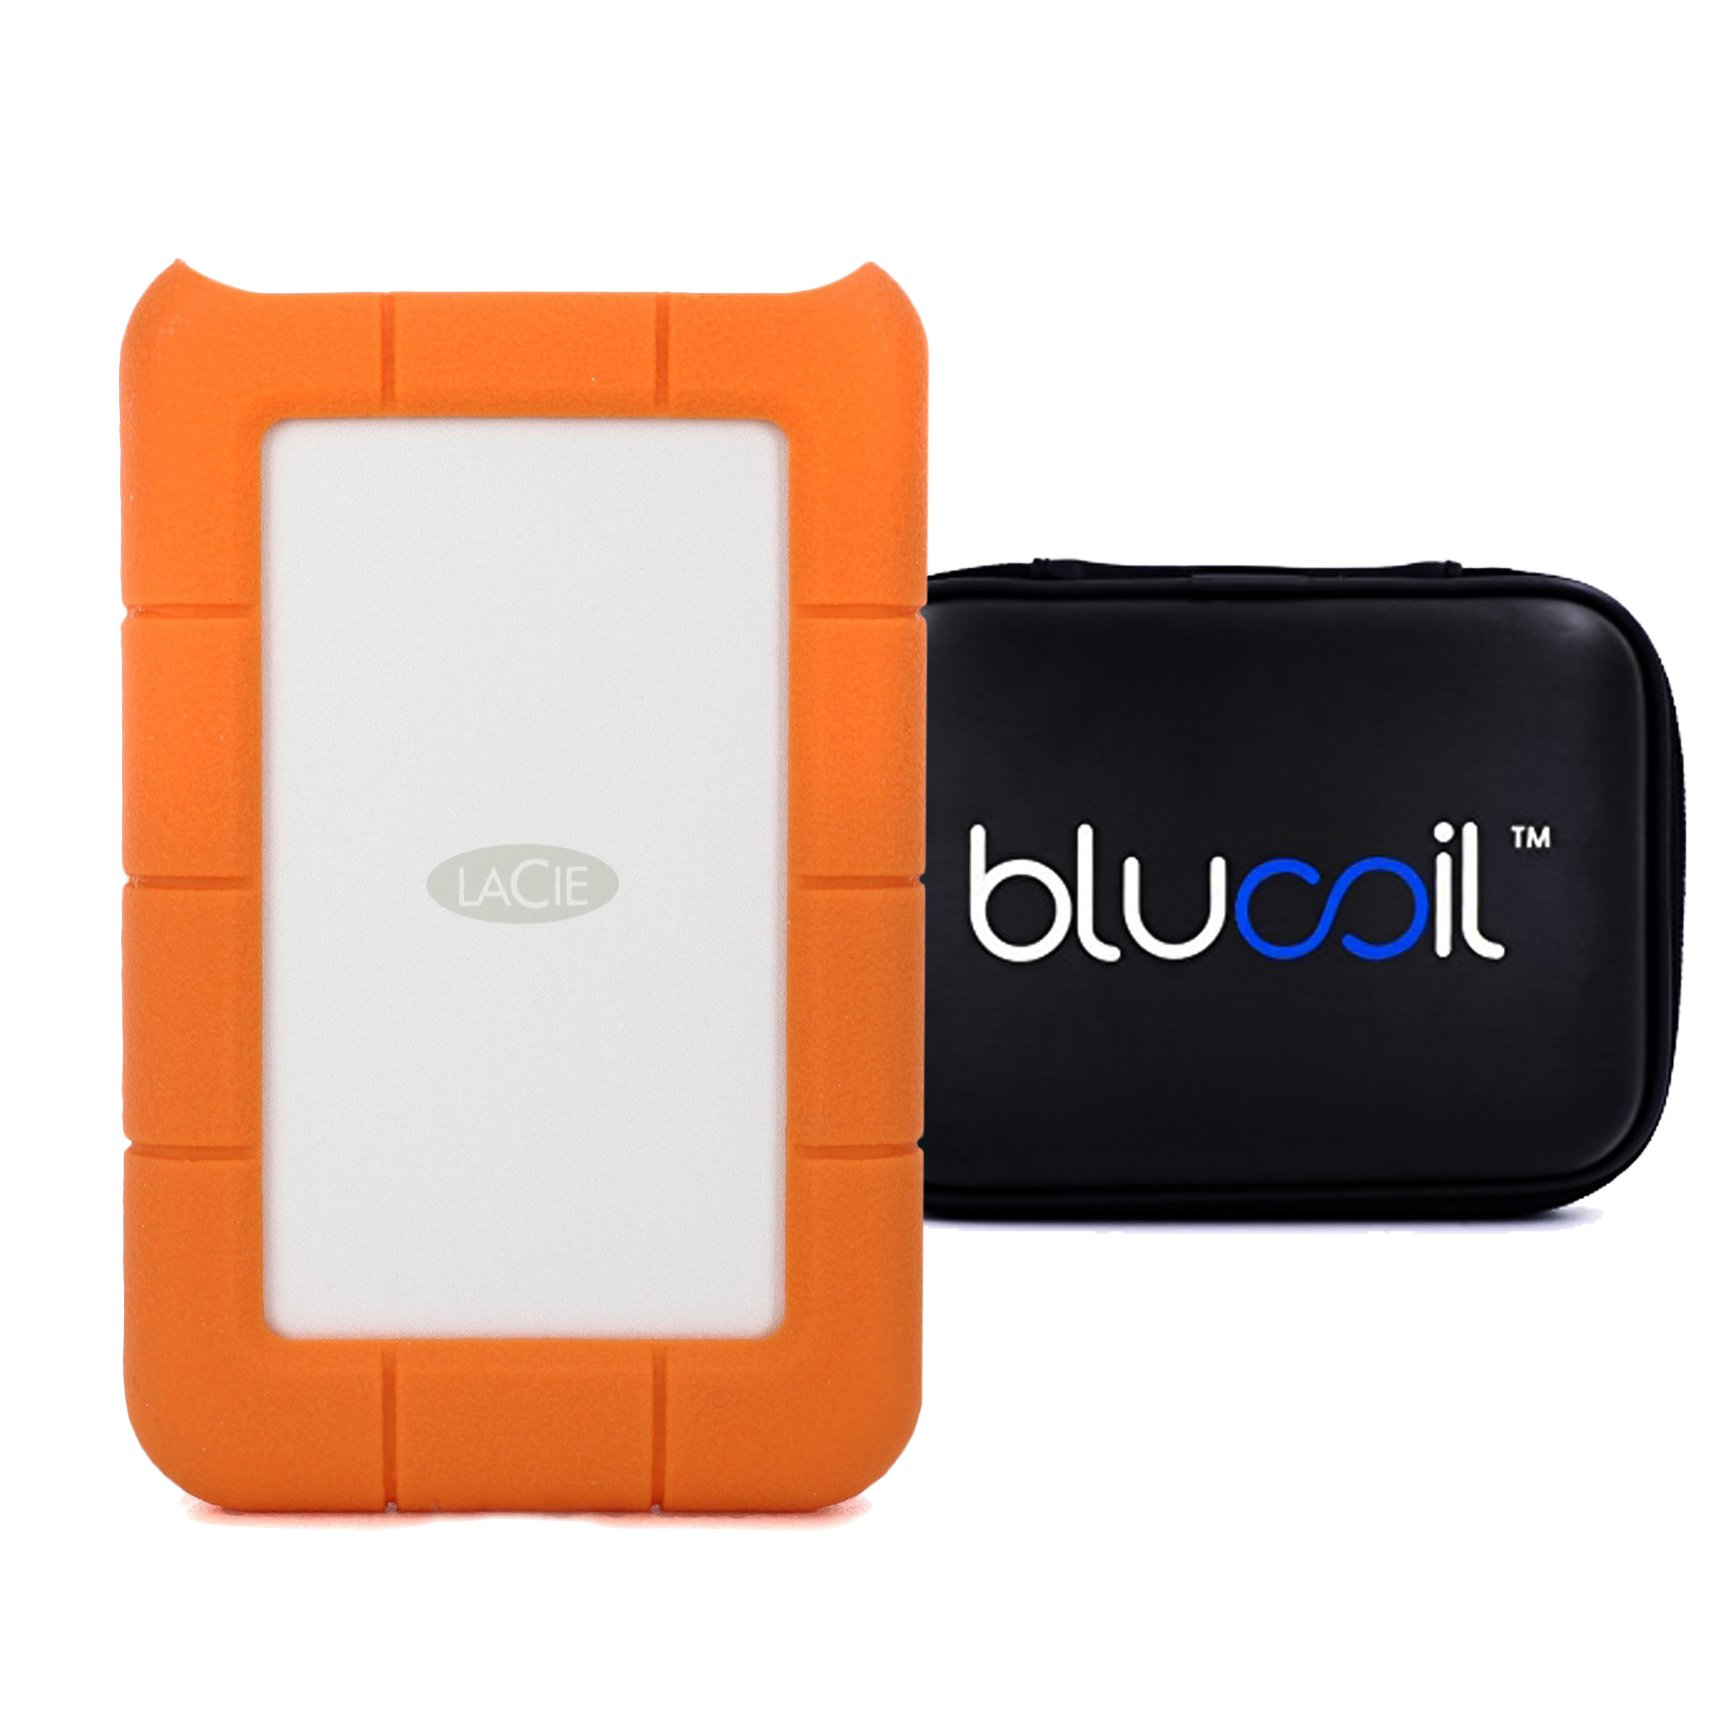 LaCie 2TB Rugged Mini Portable Hard Drive (9000298) USB 3.0 PLUS Blucoil Hard Drive Case - VALUE BUNDLE by blucoil